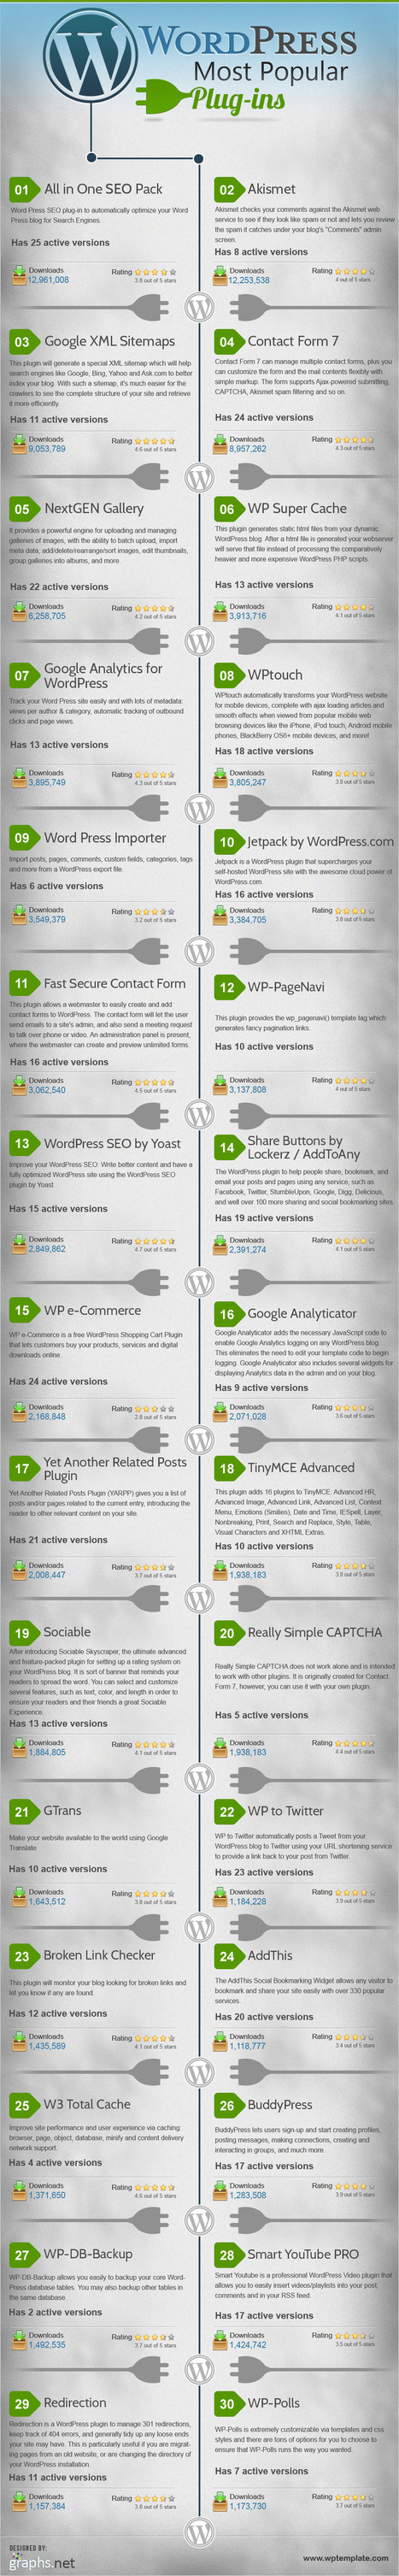 The 30 Most Popular WordPress Plugins | Social Media Marketing Australia | Scoop.it